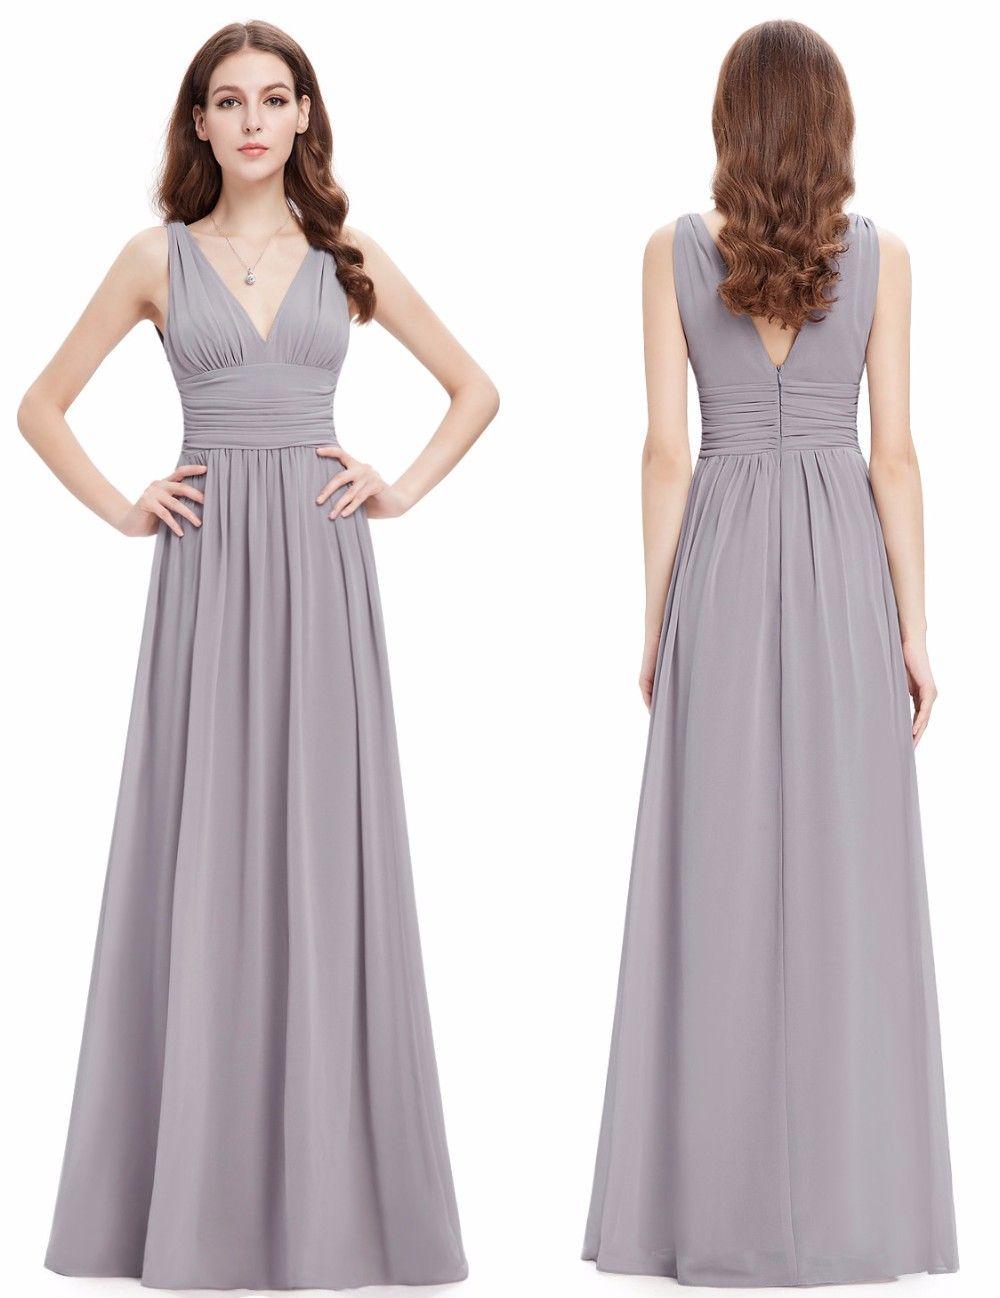 8e8e8755627 Elegant Sexy Deep V Collar Long Silver Gray Chiffon Bridesmaid Dresses Red  Halter Shoulders Pure Hand Grip Fold Prom Party Dresses Bridemaid Dresses  ...